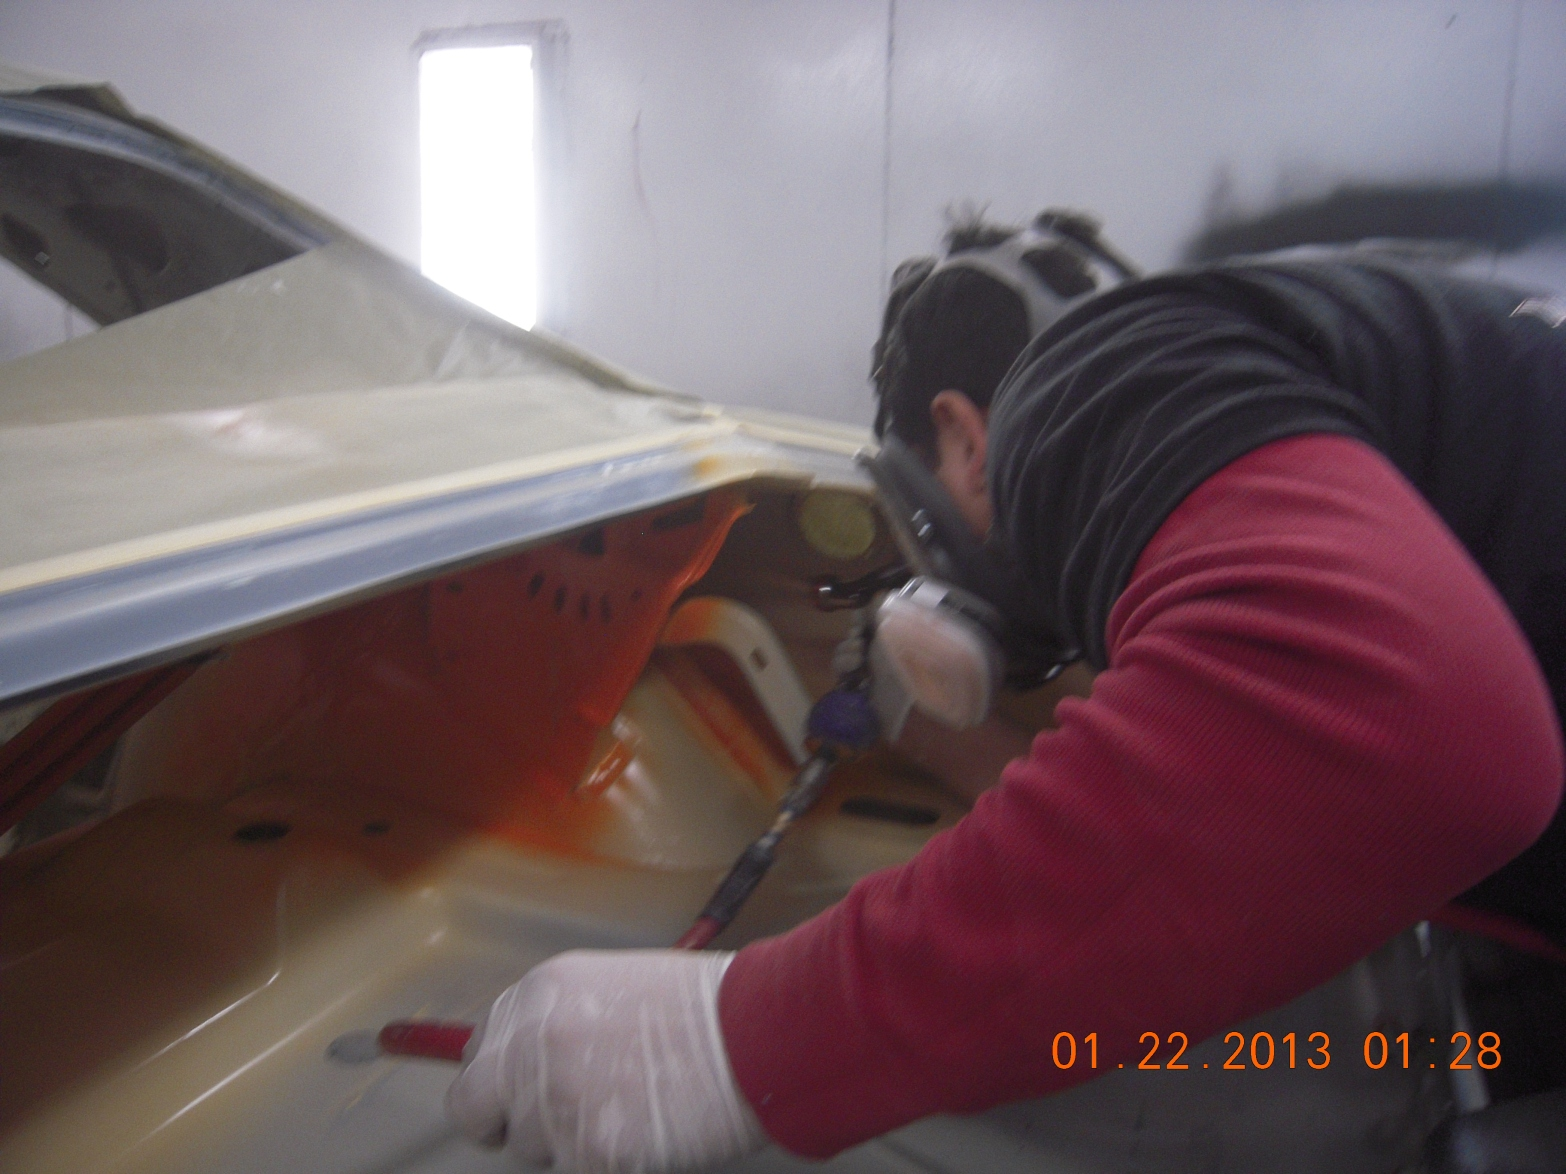 west-coast-body-and-paint-orange-1970-challenger-83